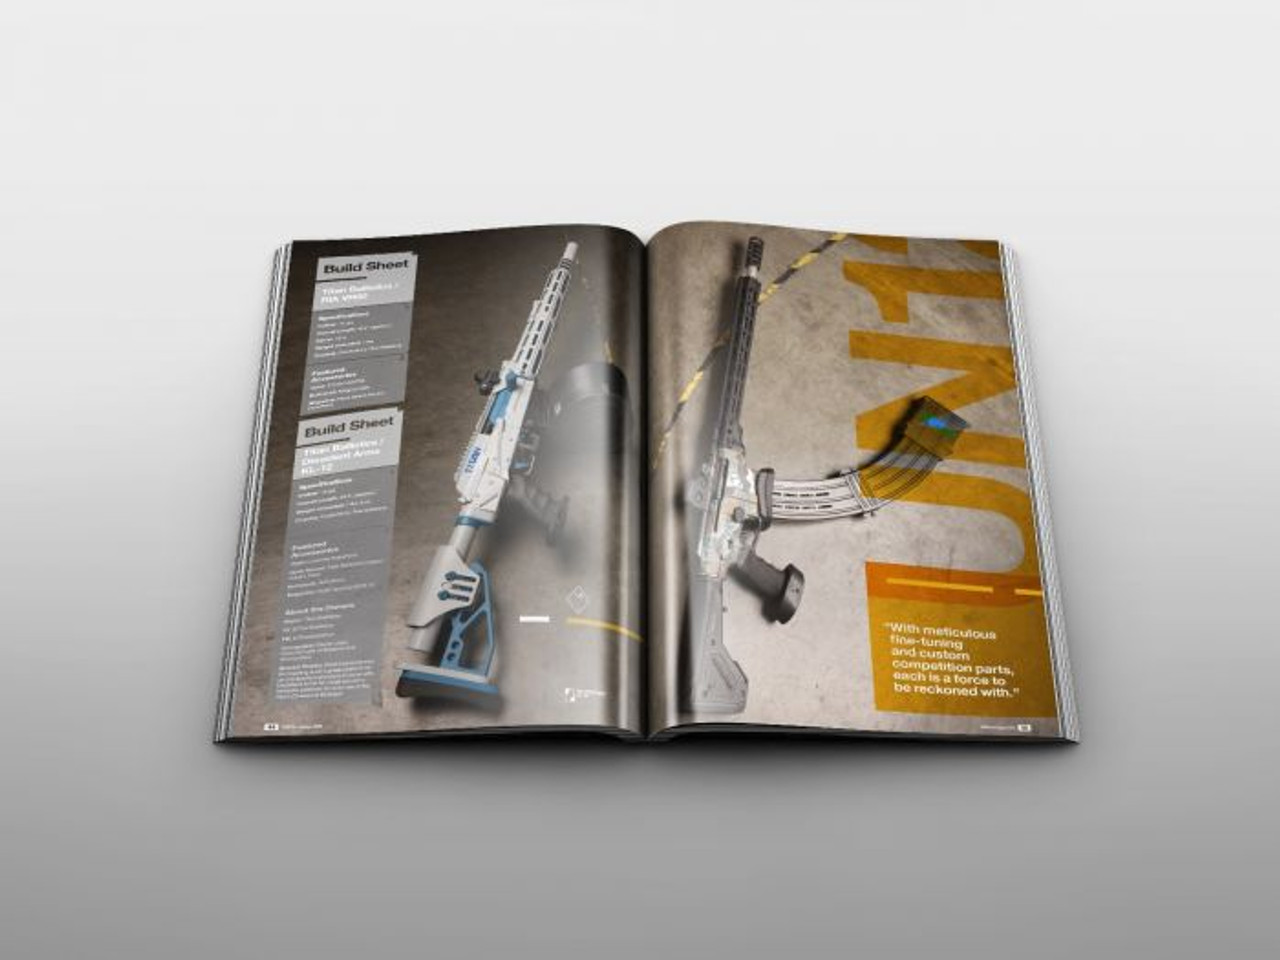 UN12 Magazine - Issue 8